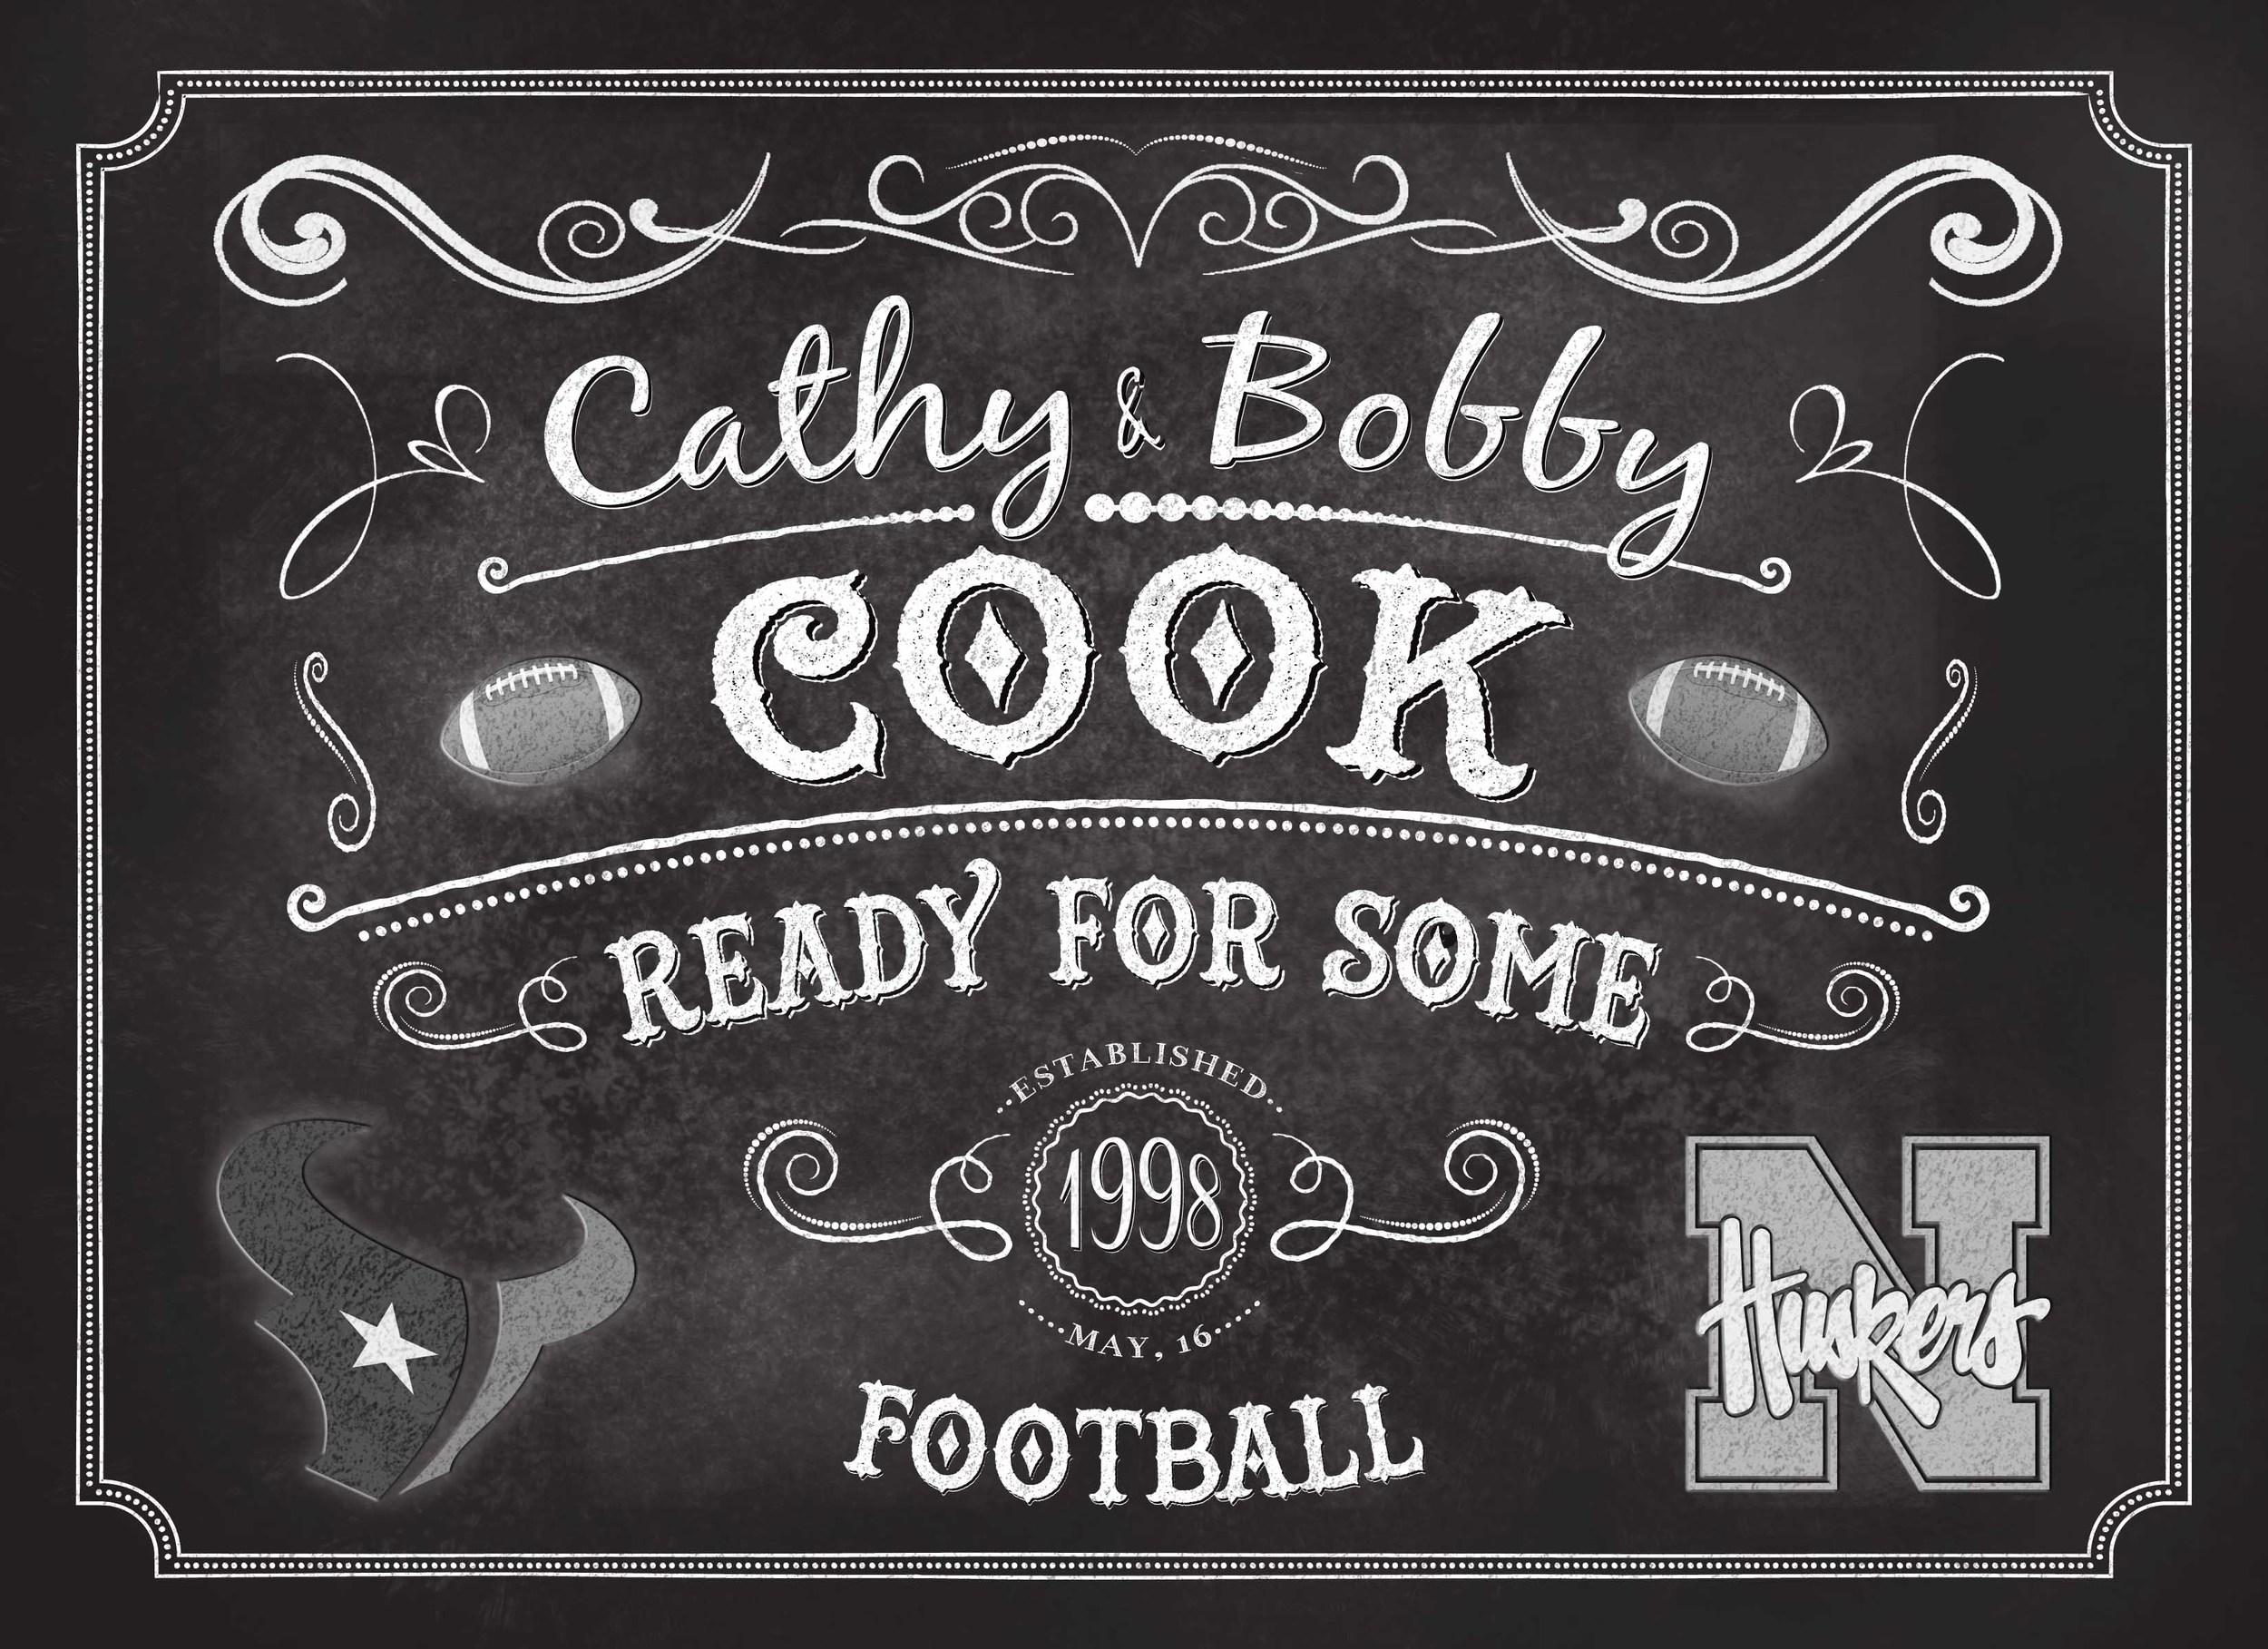 cook CB.jpg